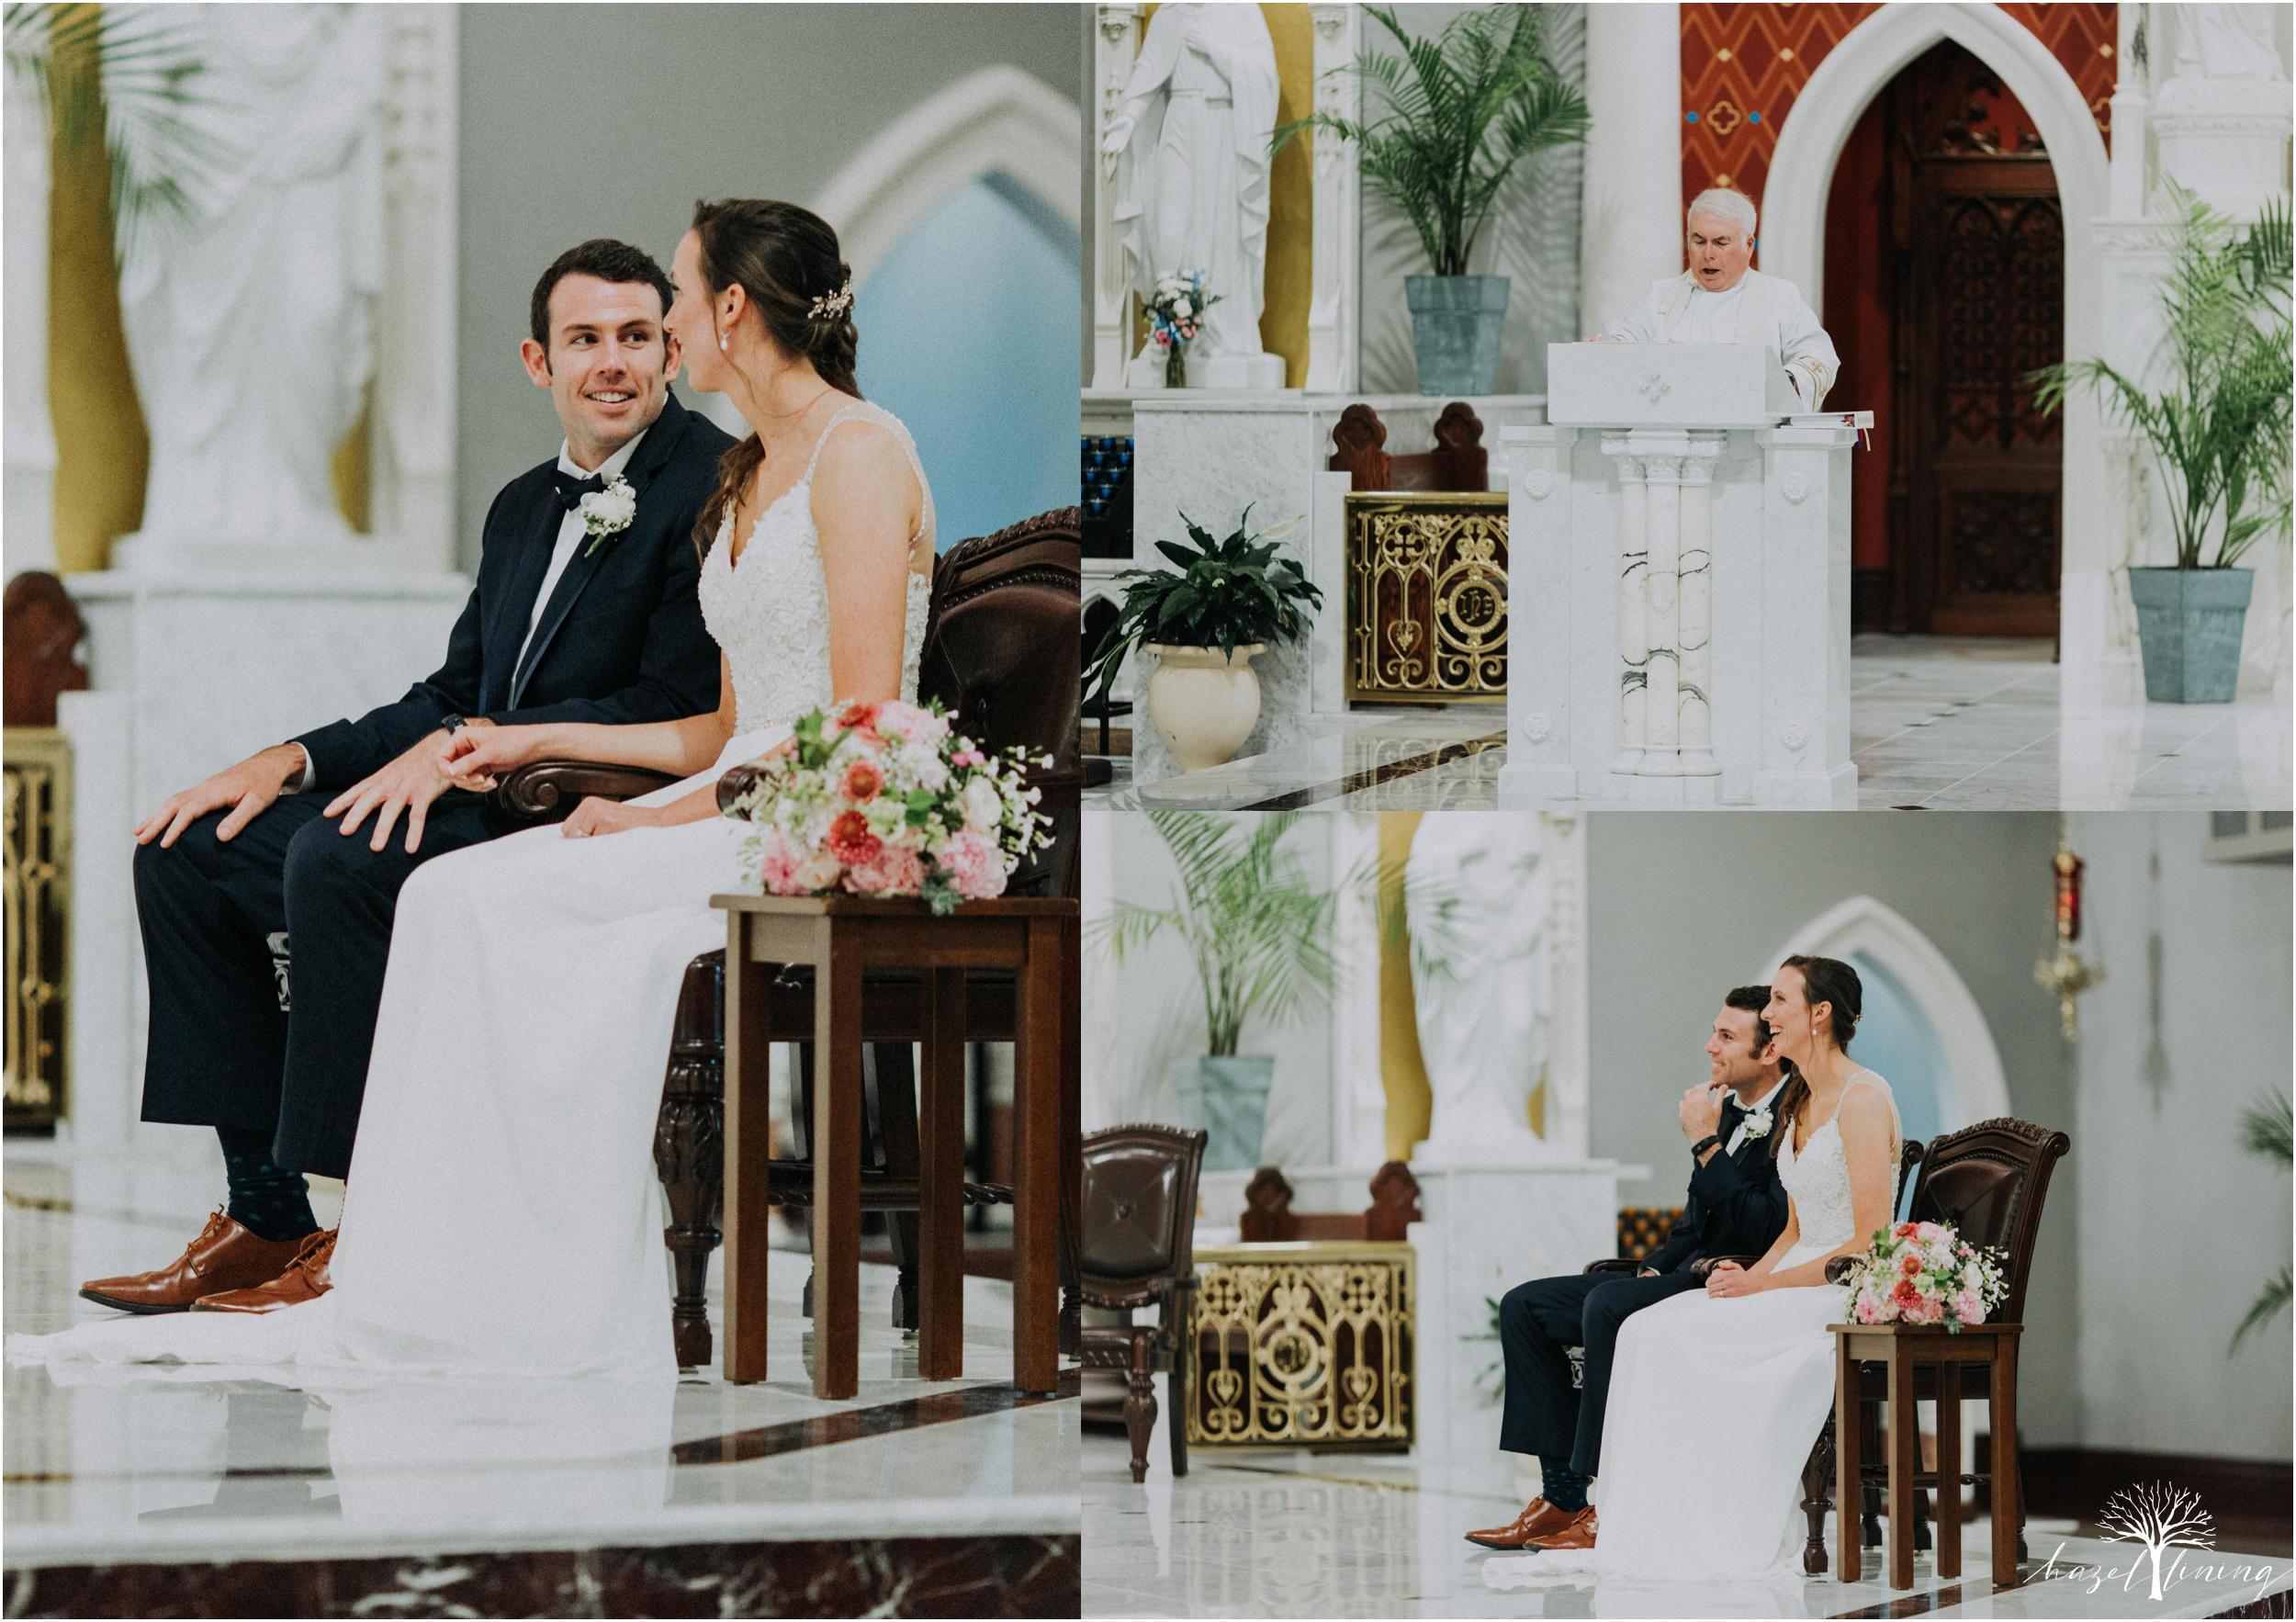 hazel-lining-travel-wedding-elopement-photography_0055.jpg